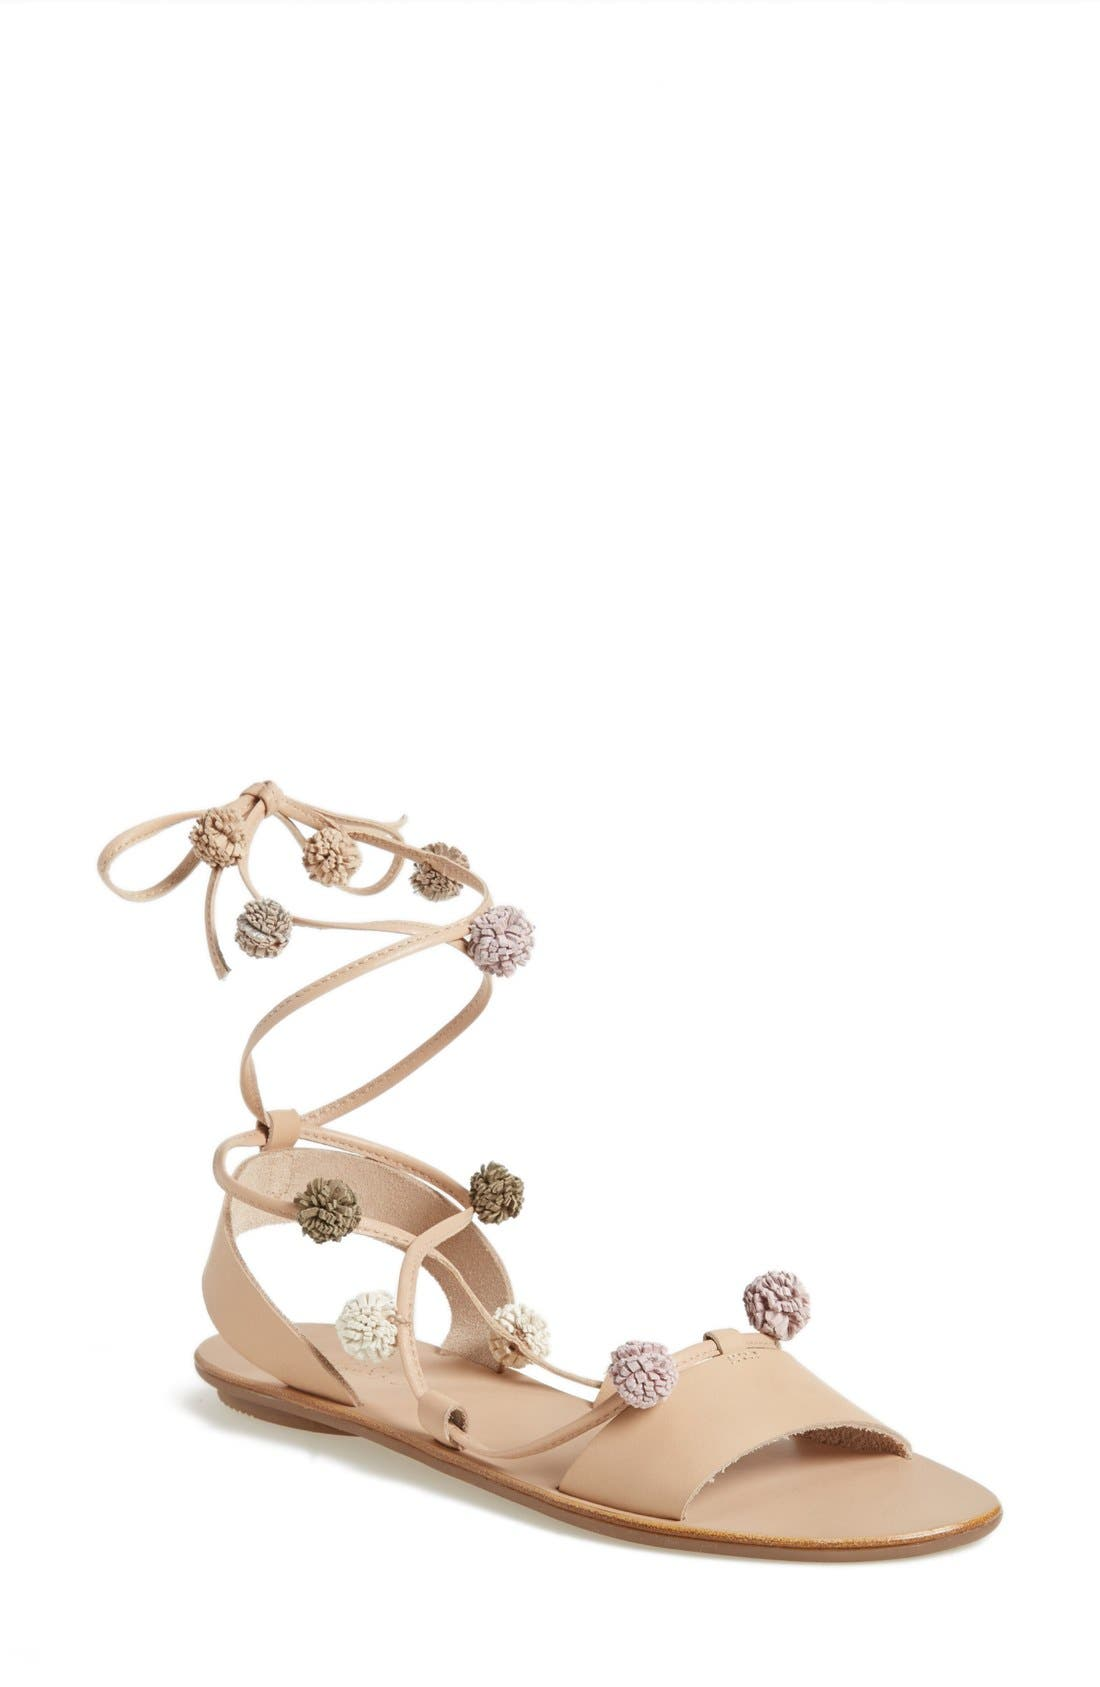 Alternate Image 1 Selected - Loeffler Randall 'Saskia' Flat Sandal (Women)